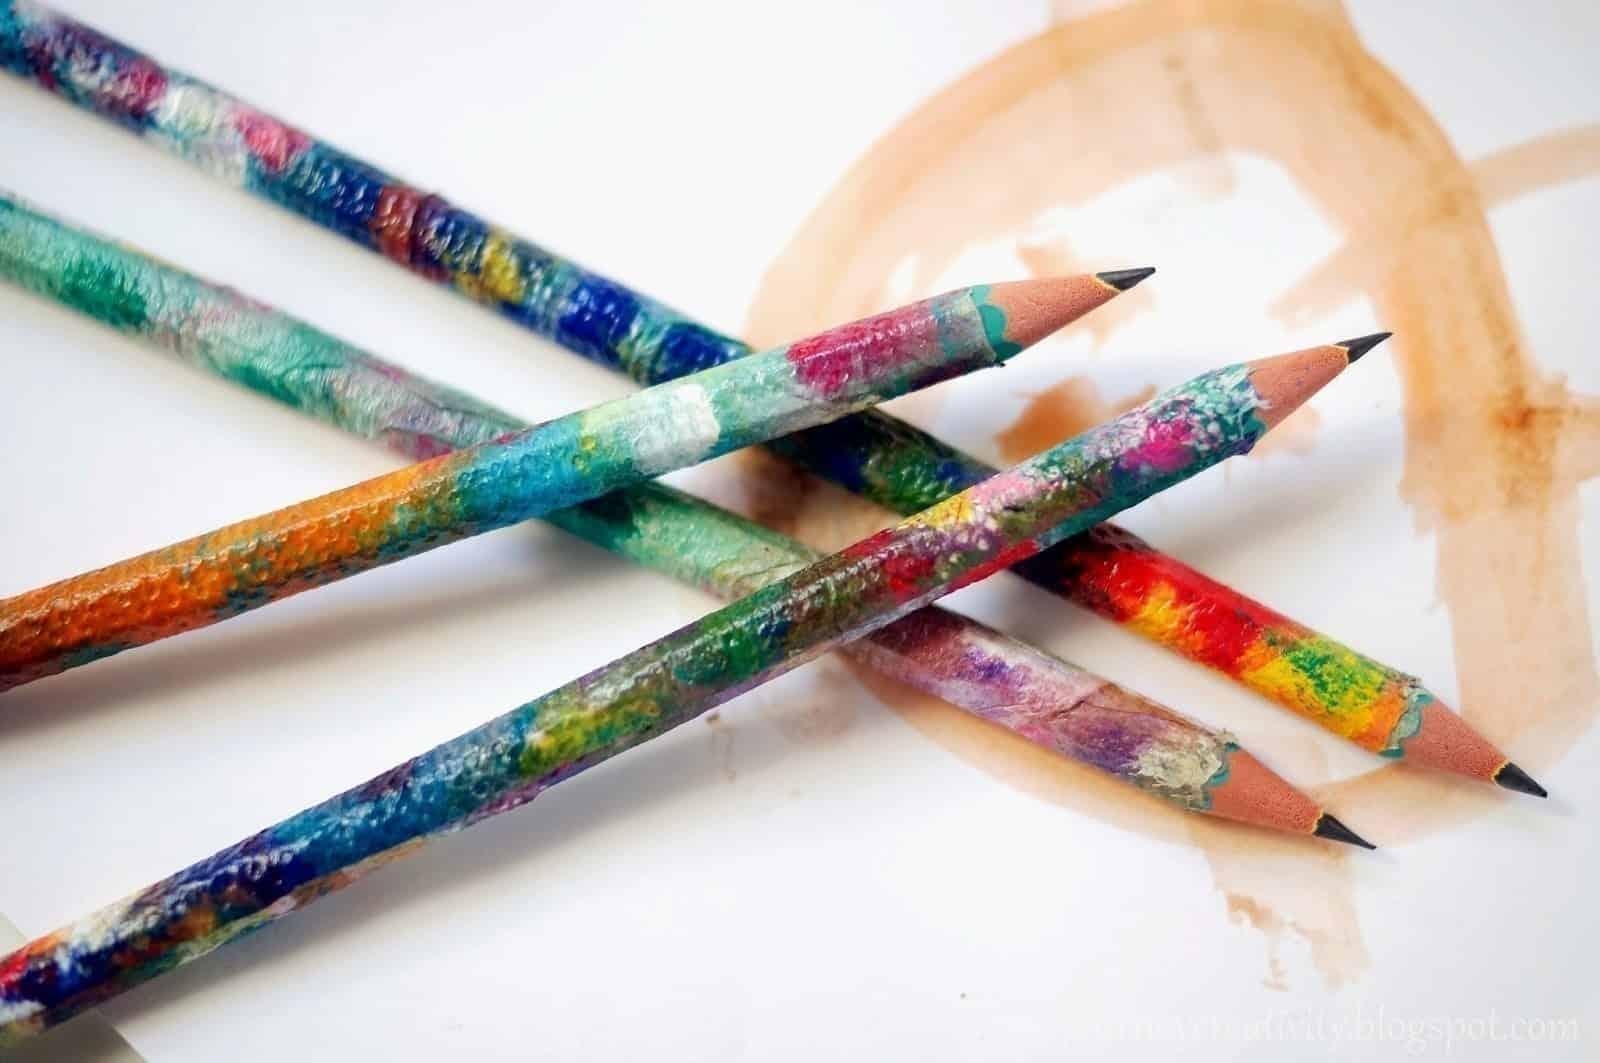 Napkin pencils